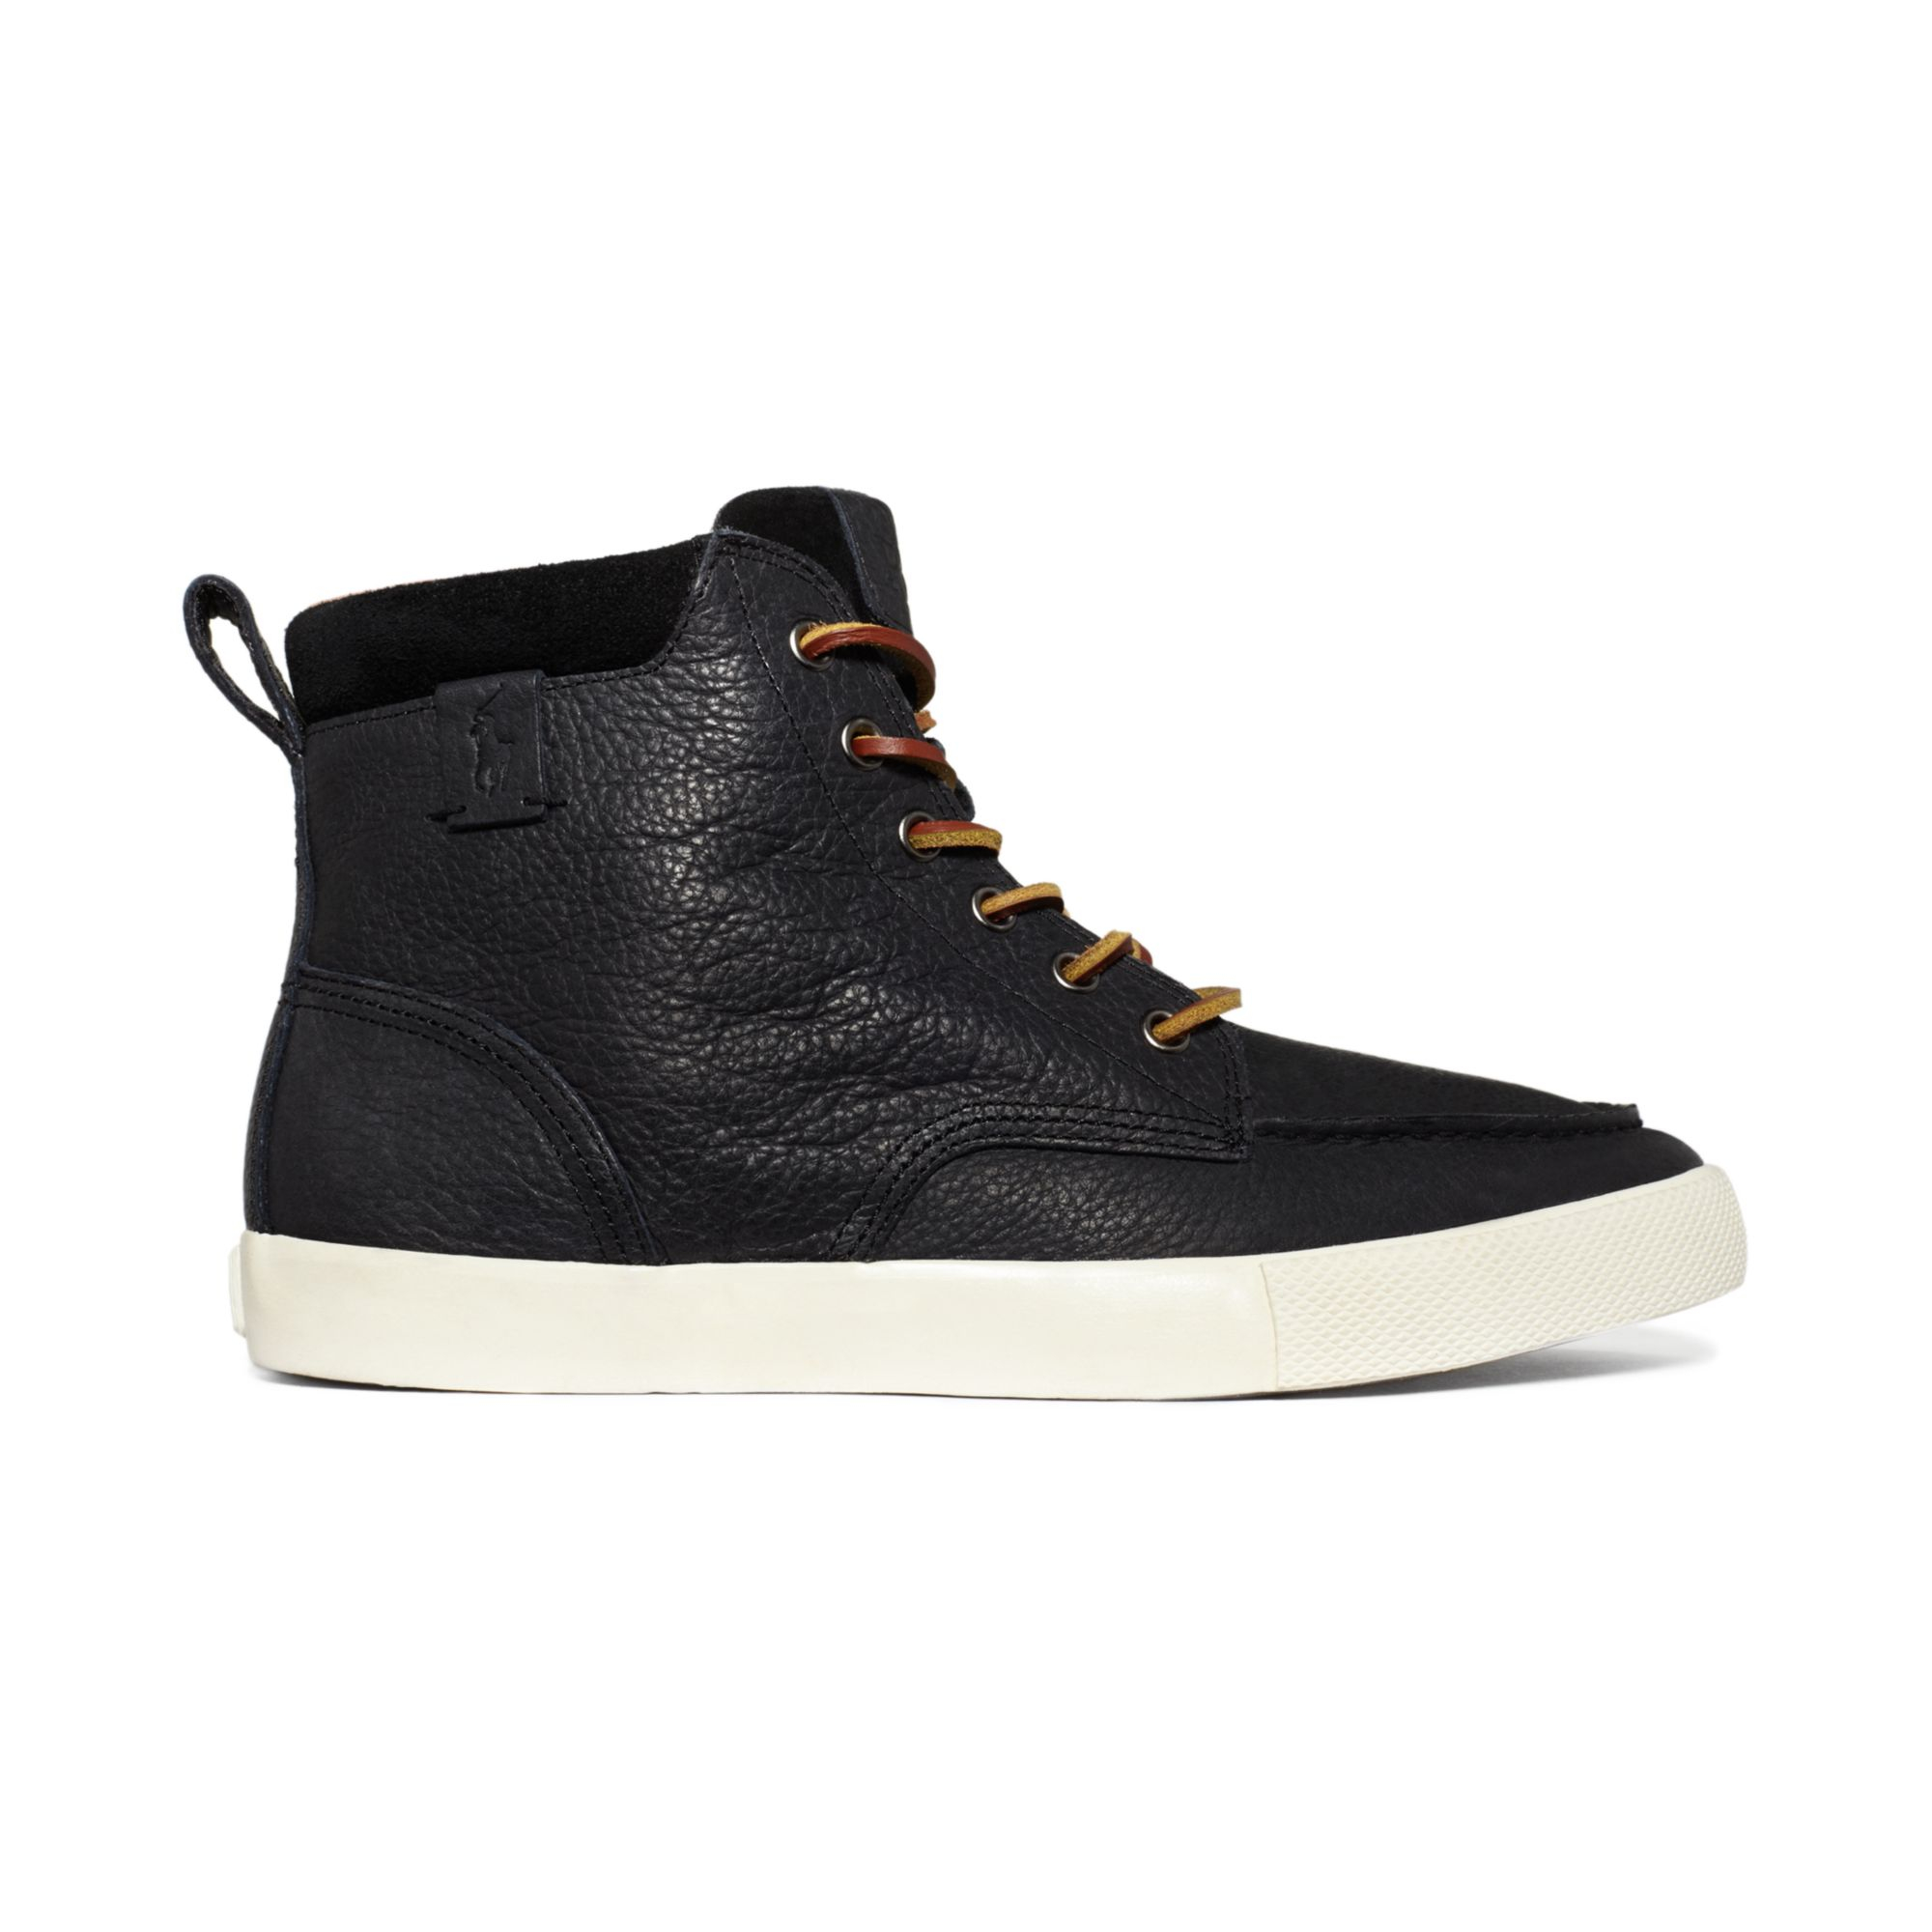 polo ralph lauren shoes tedd hi top sneakers in black for men black black lyst. Black Bedroom Furniture Sets. Home Design Ideas